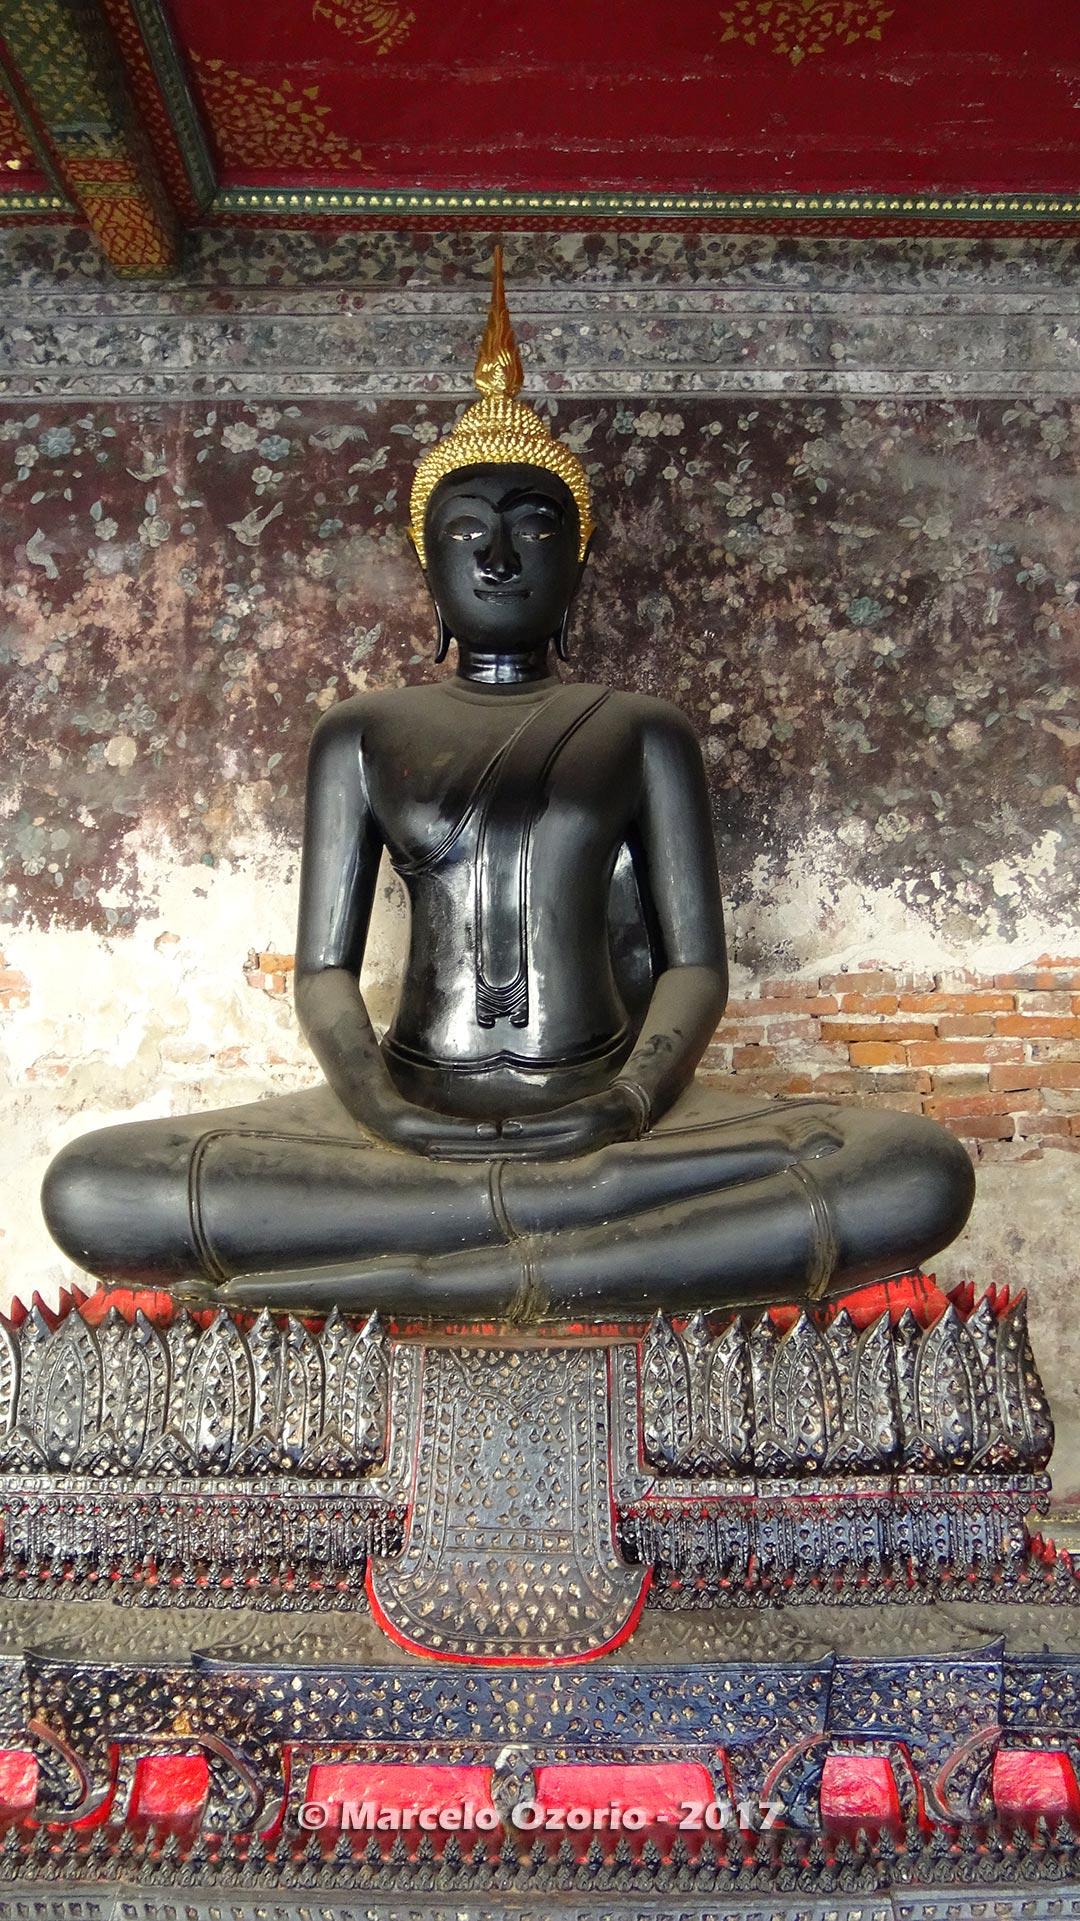 budhas bangkok thailand serie 1 - Buddhas of Bangkok - Thailand